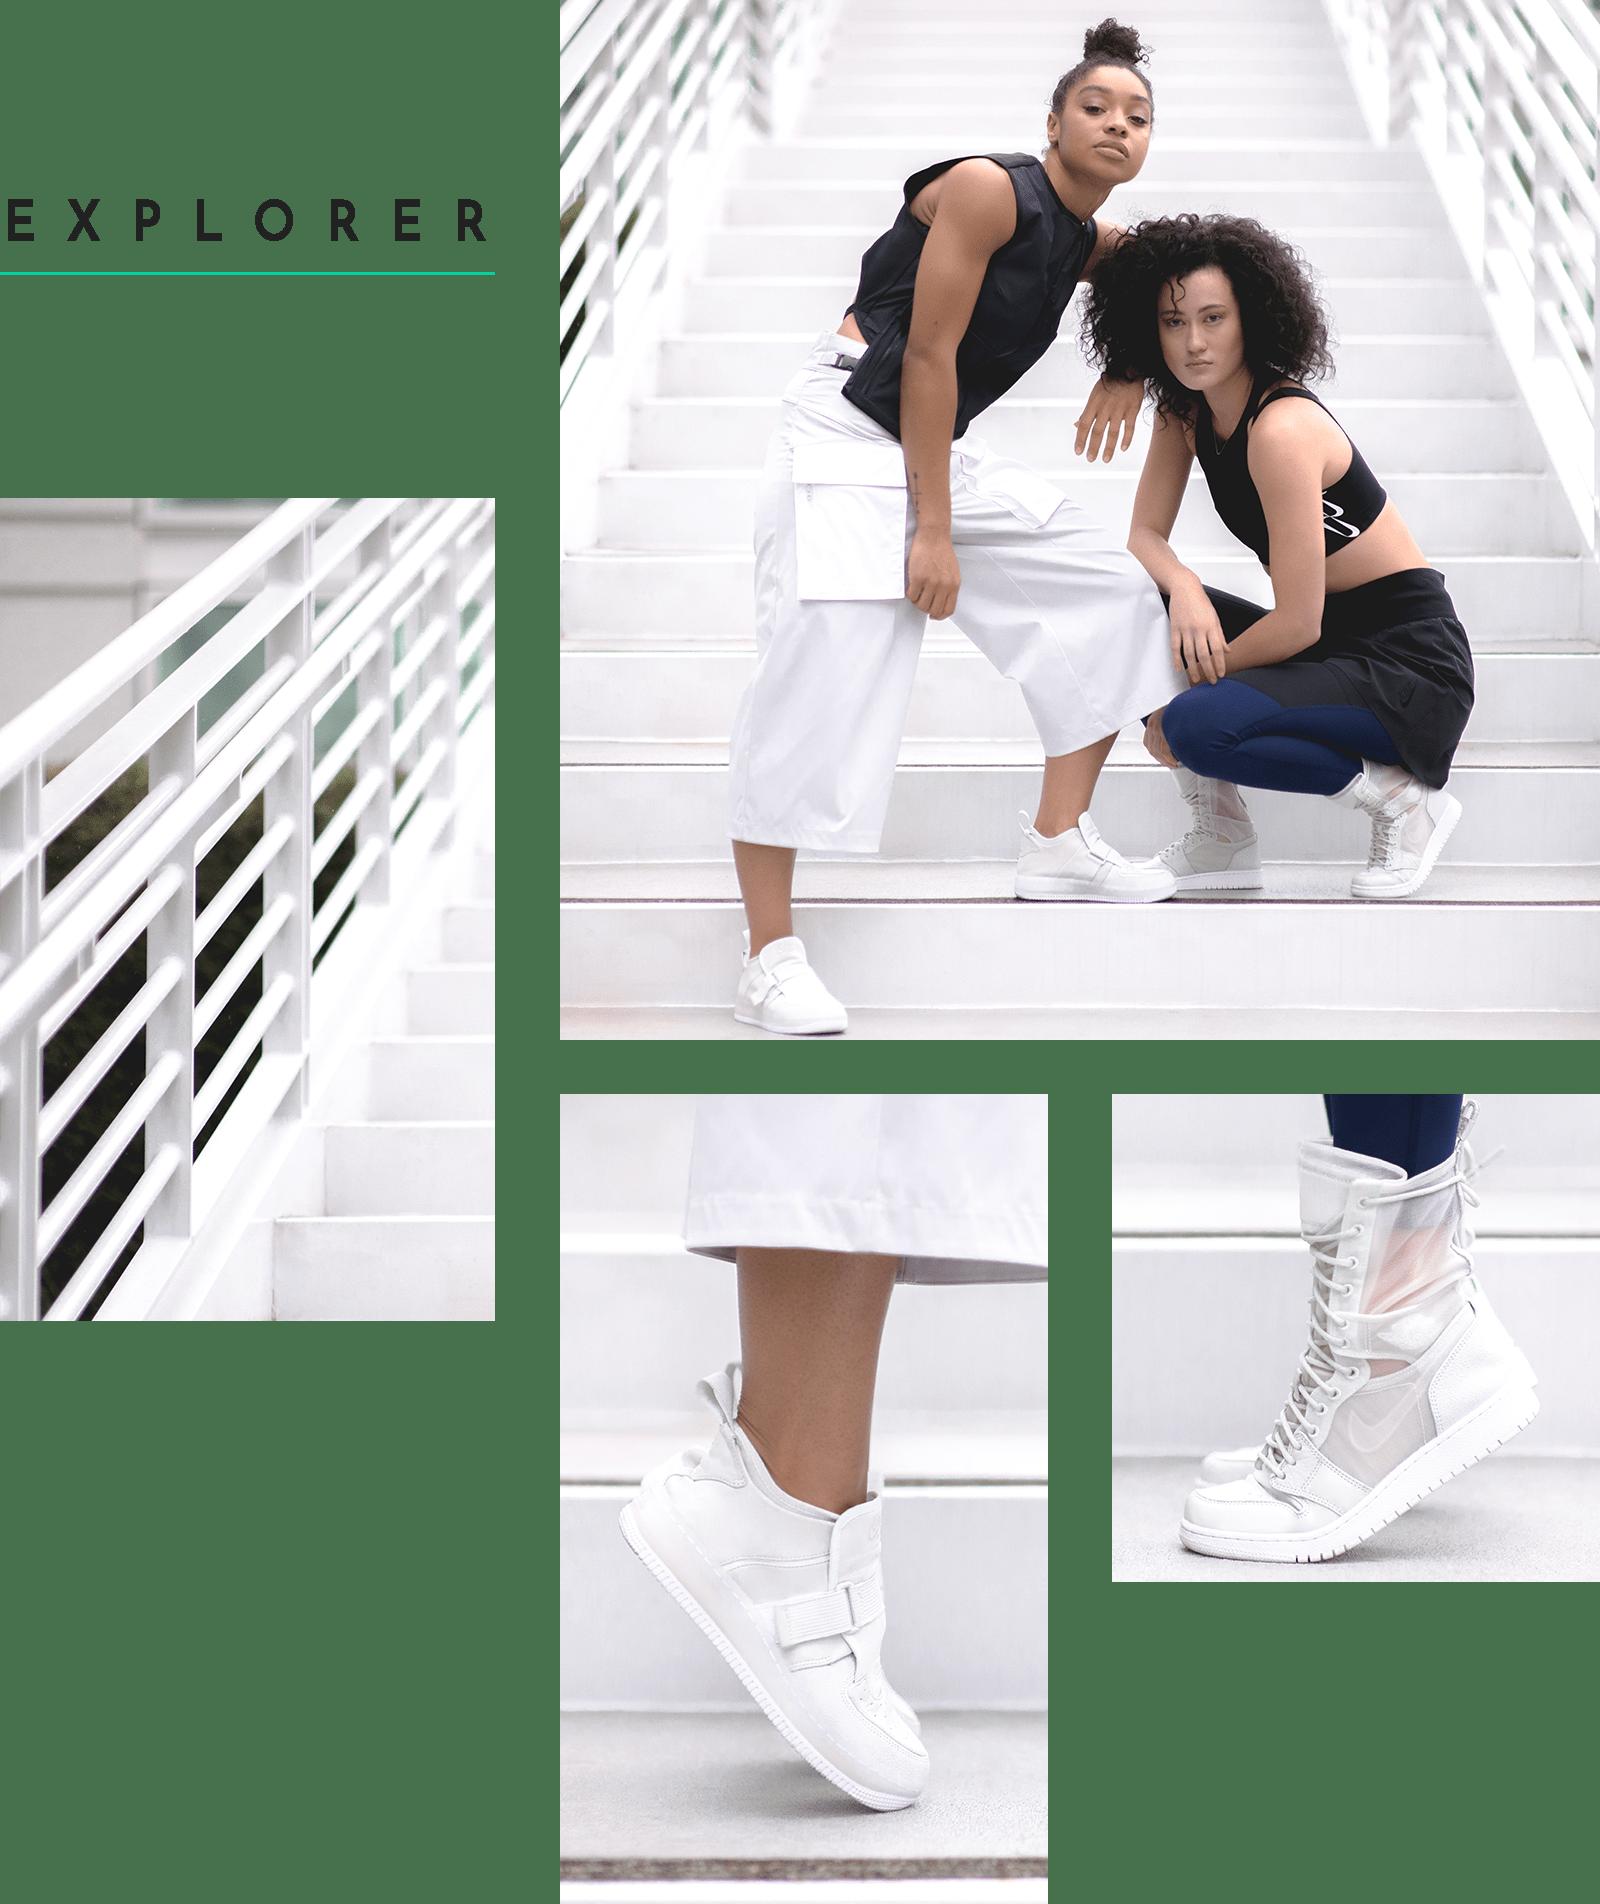 Nike The 1 Reimagined EXPLORER XX Air Force Jordan Boot See Through Female Designer Design Collective Women Editorial Closer Look Lookbook White